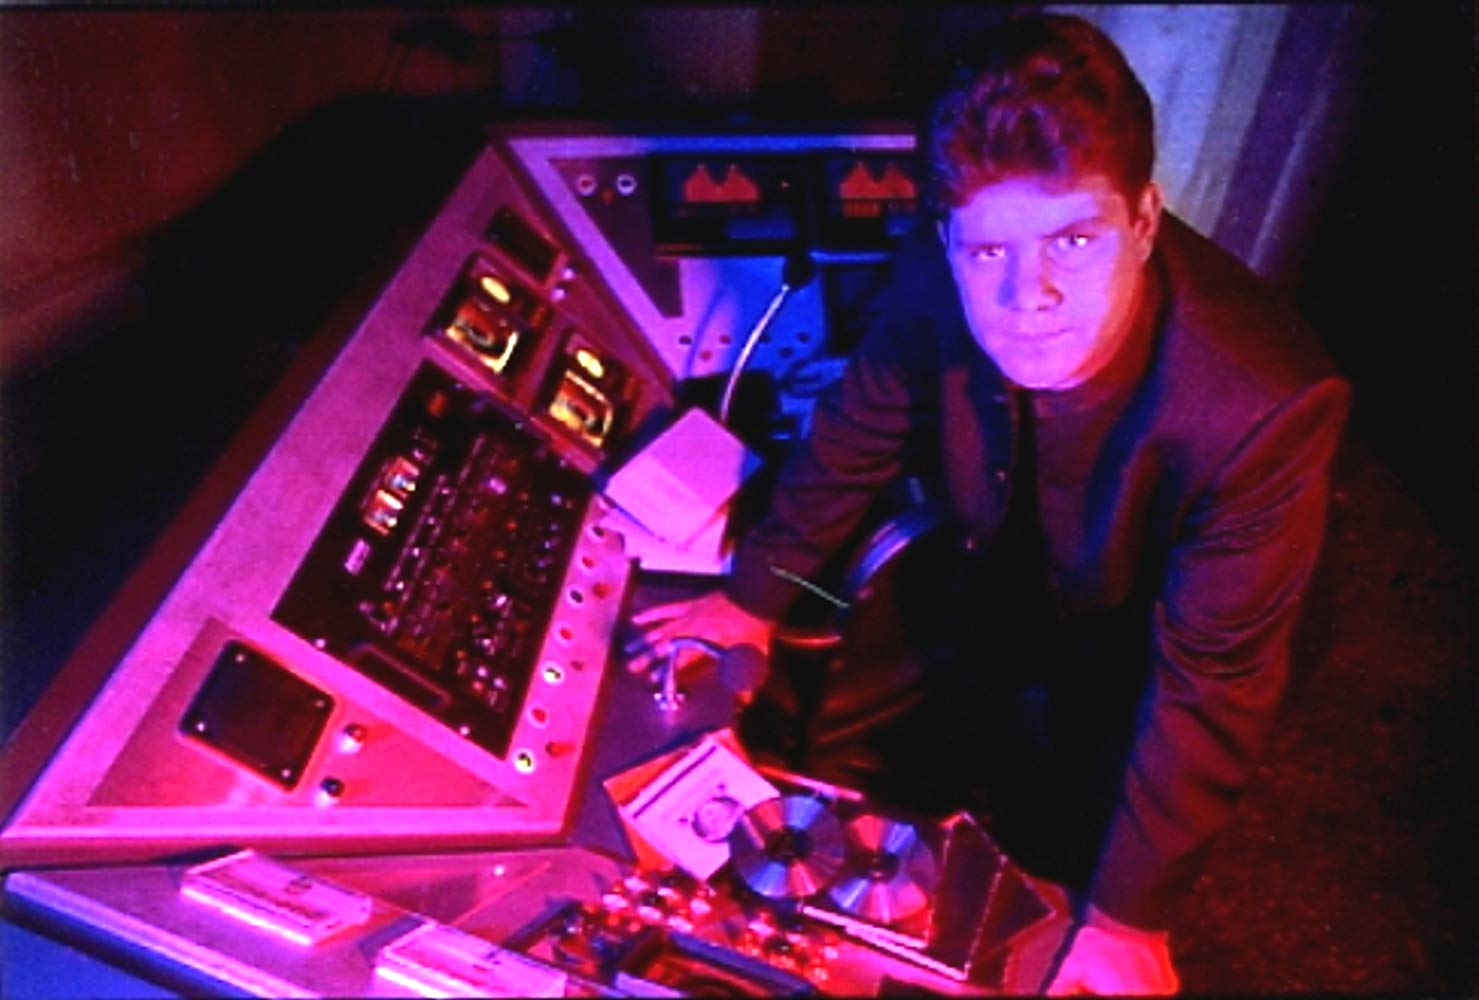 Harrison Bergeron (Sean Astin) takes over the tv studio in Harrison Bergeron (1995)